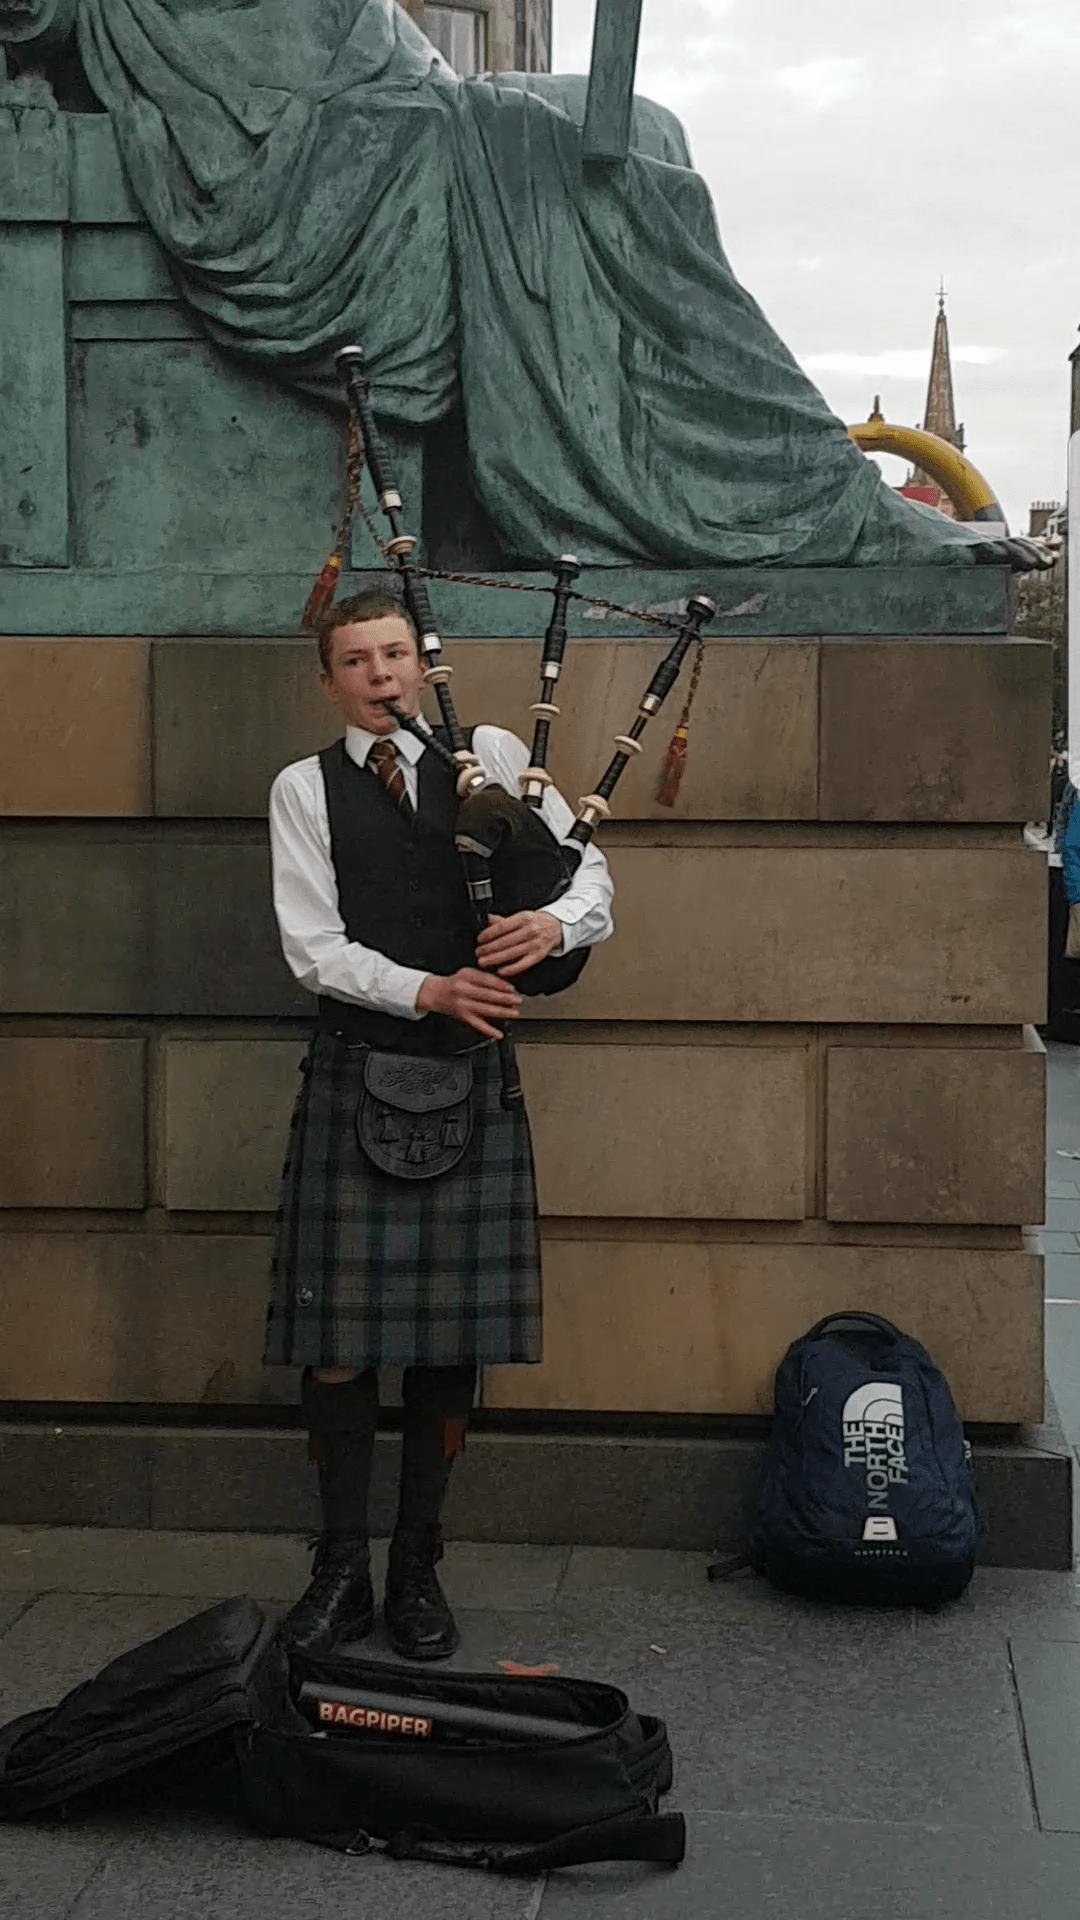 Bagpipes at the Edinburgh Festival #fromthecornertable